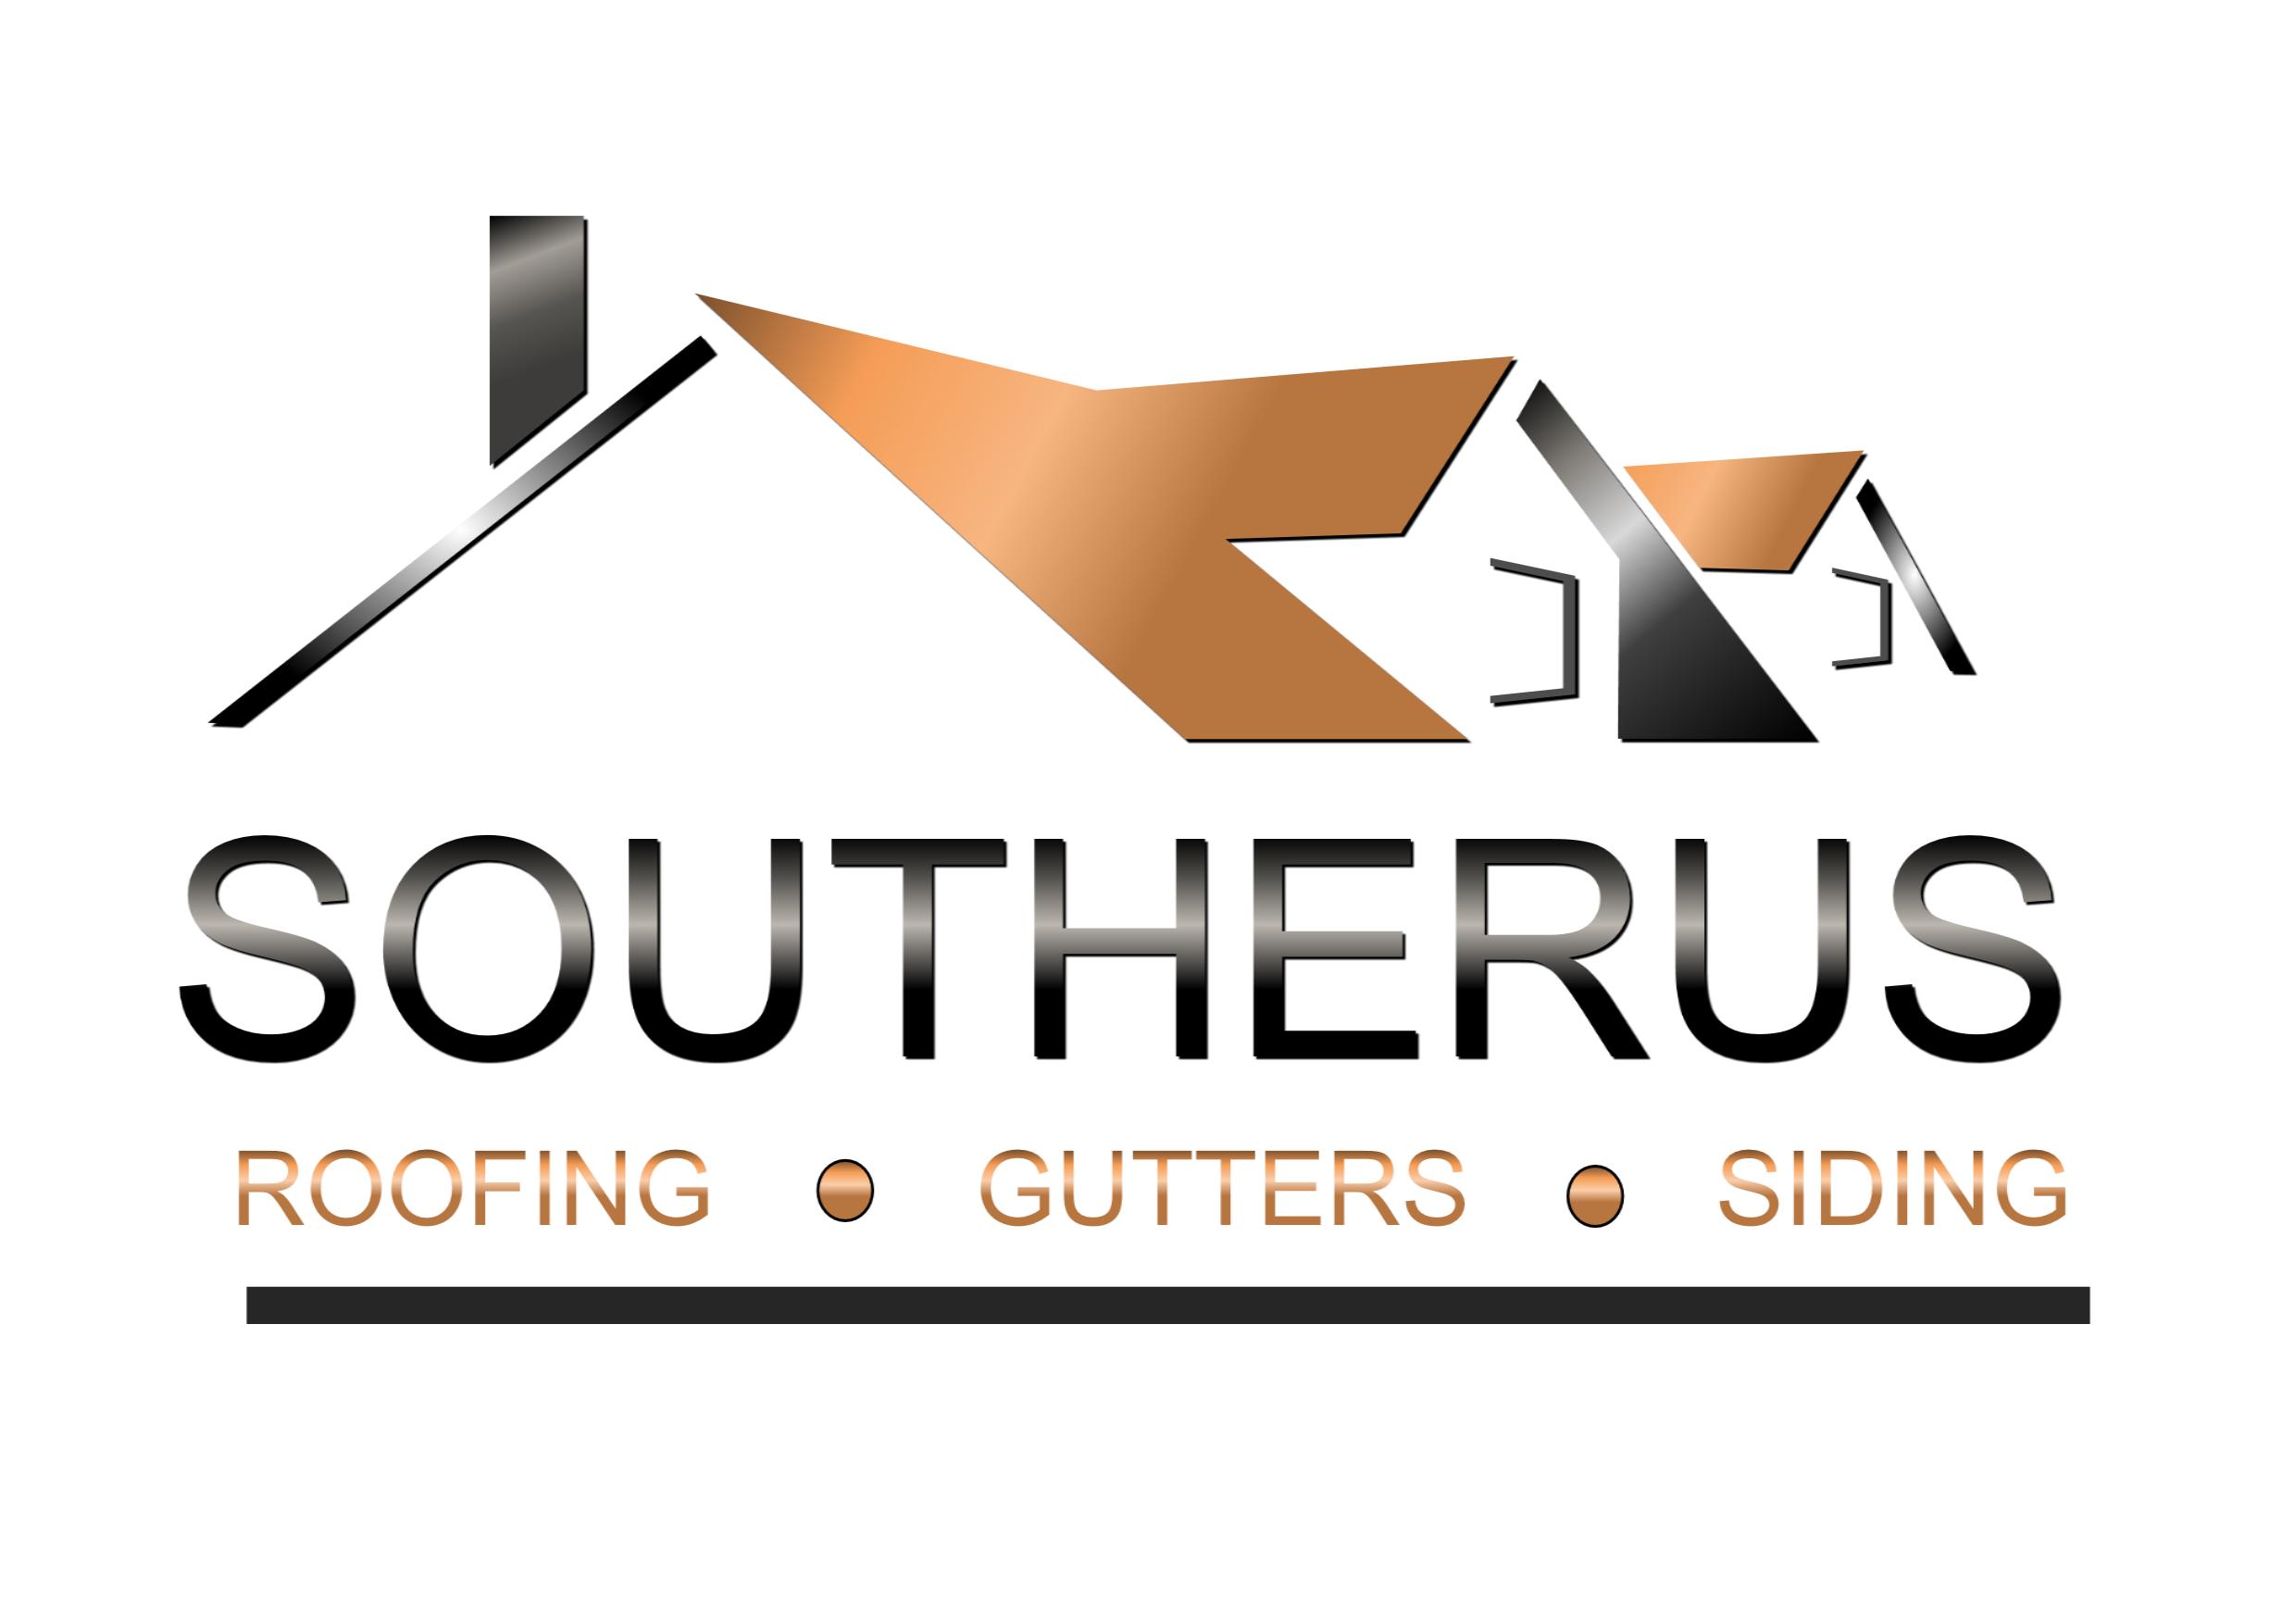 roof logos rh logolynx com best roofing company logos roofing company logo maker